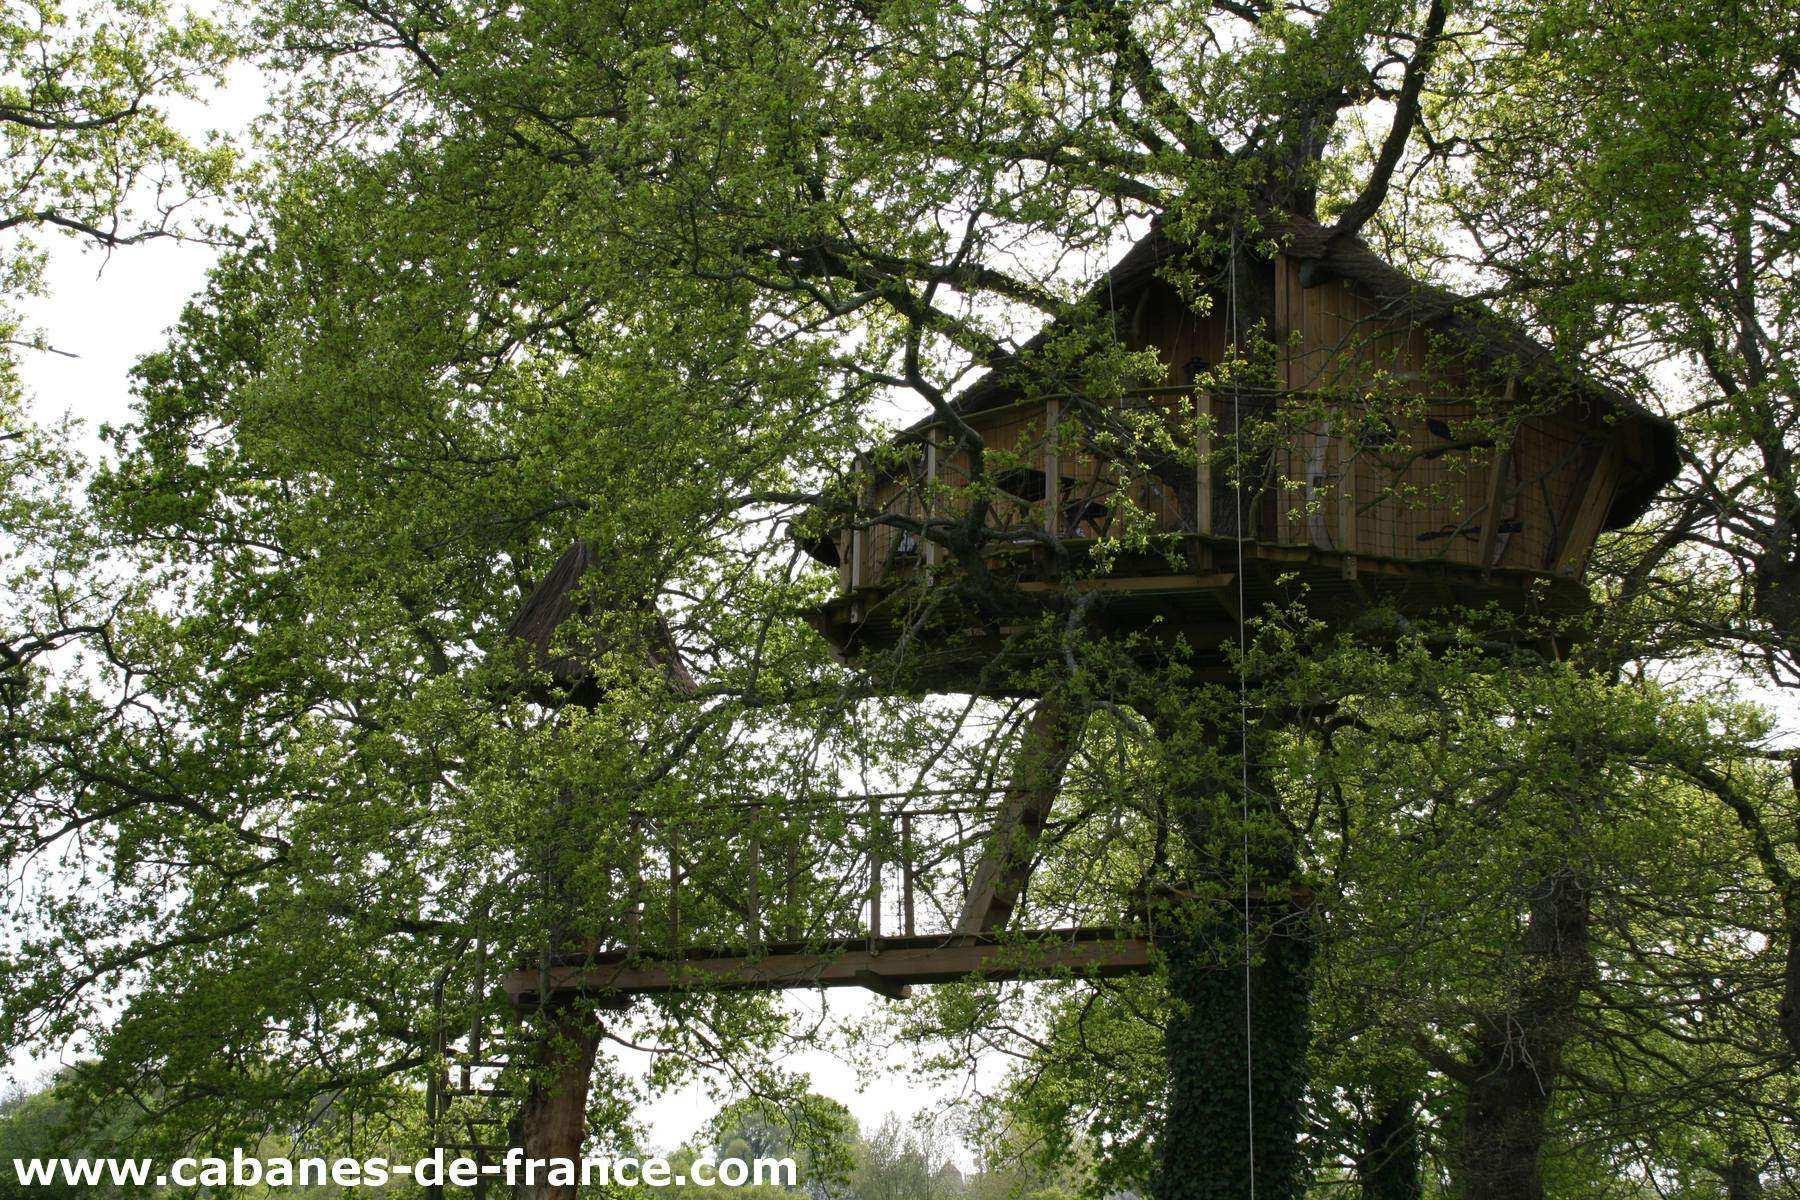 cabane des farfadets manoir de l 39 alleu cabane dans les arbres en bretagne cabanes de france. Black Bedroom Furniture Sets. Home Design Ideas